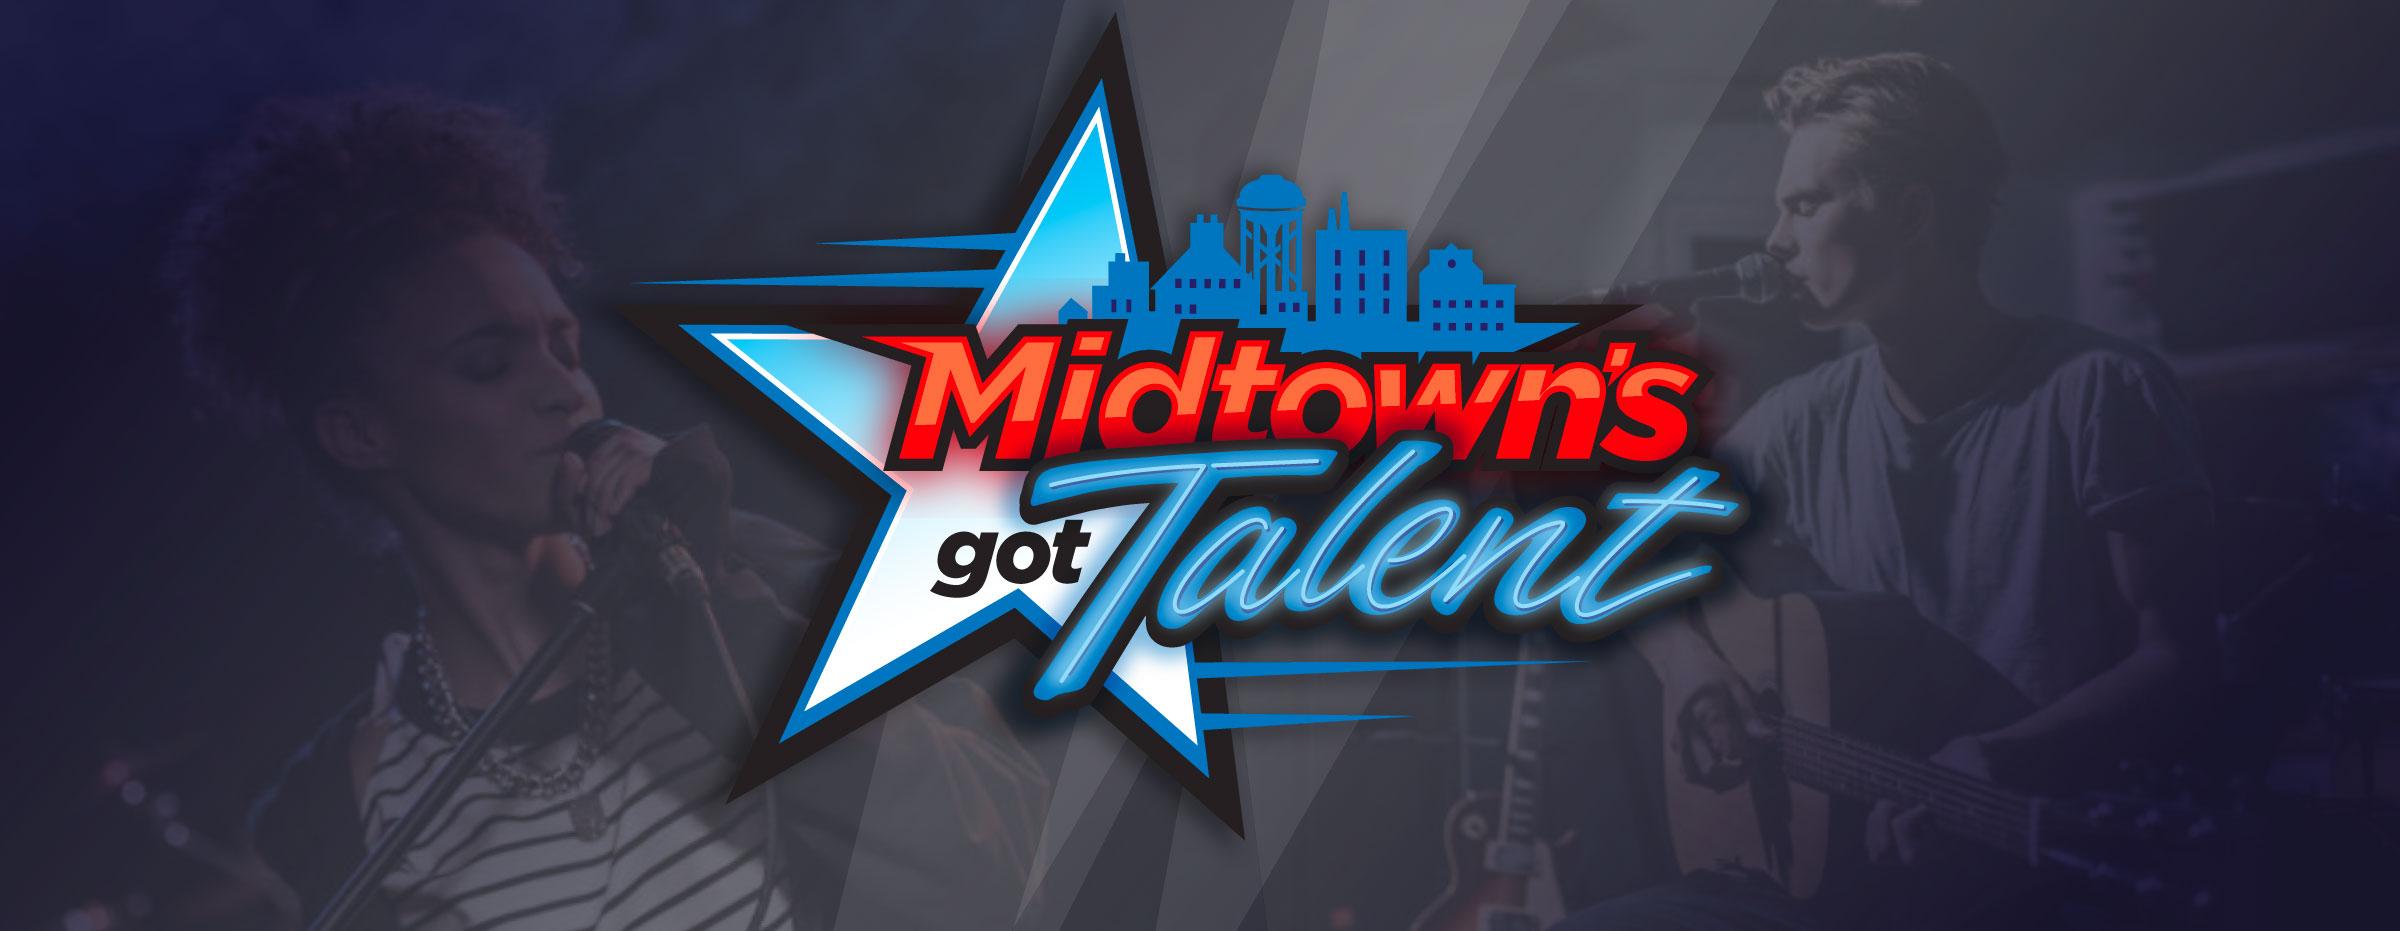 Midtown's got Talent